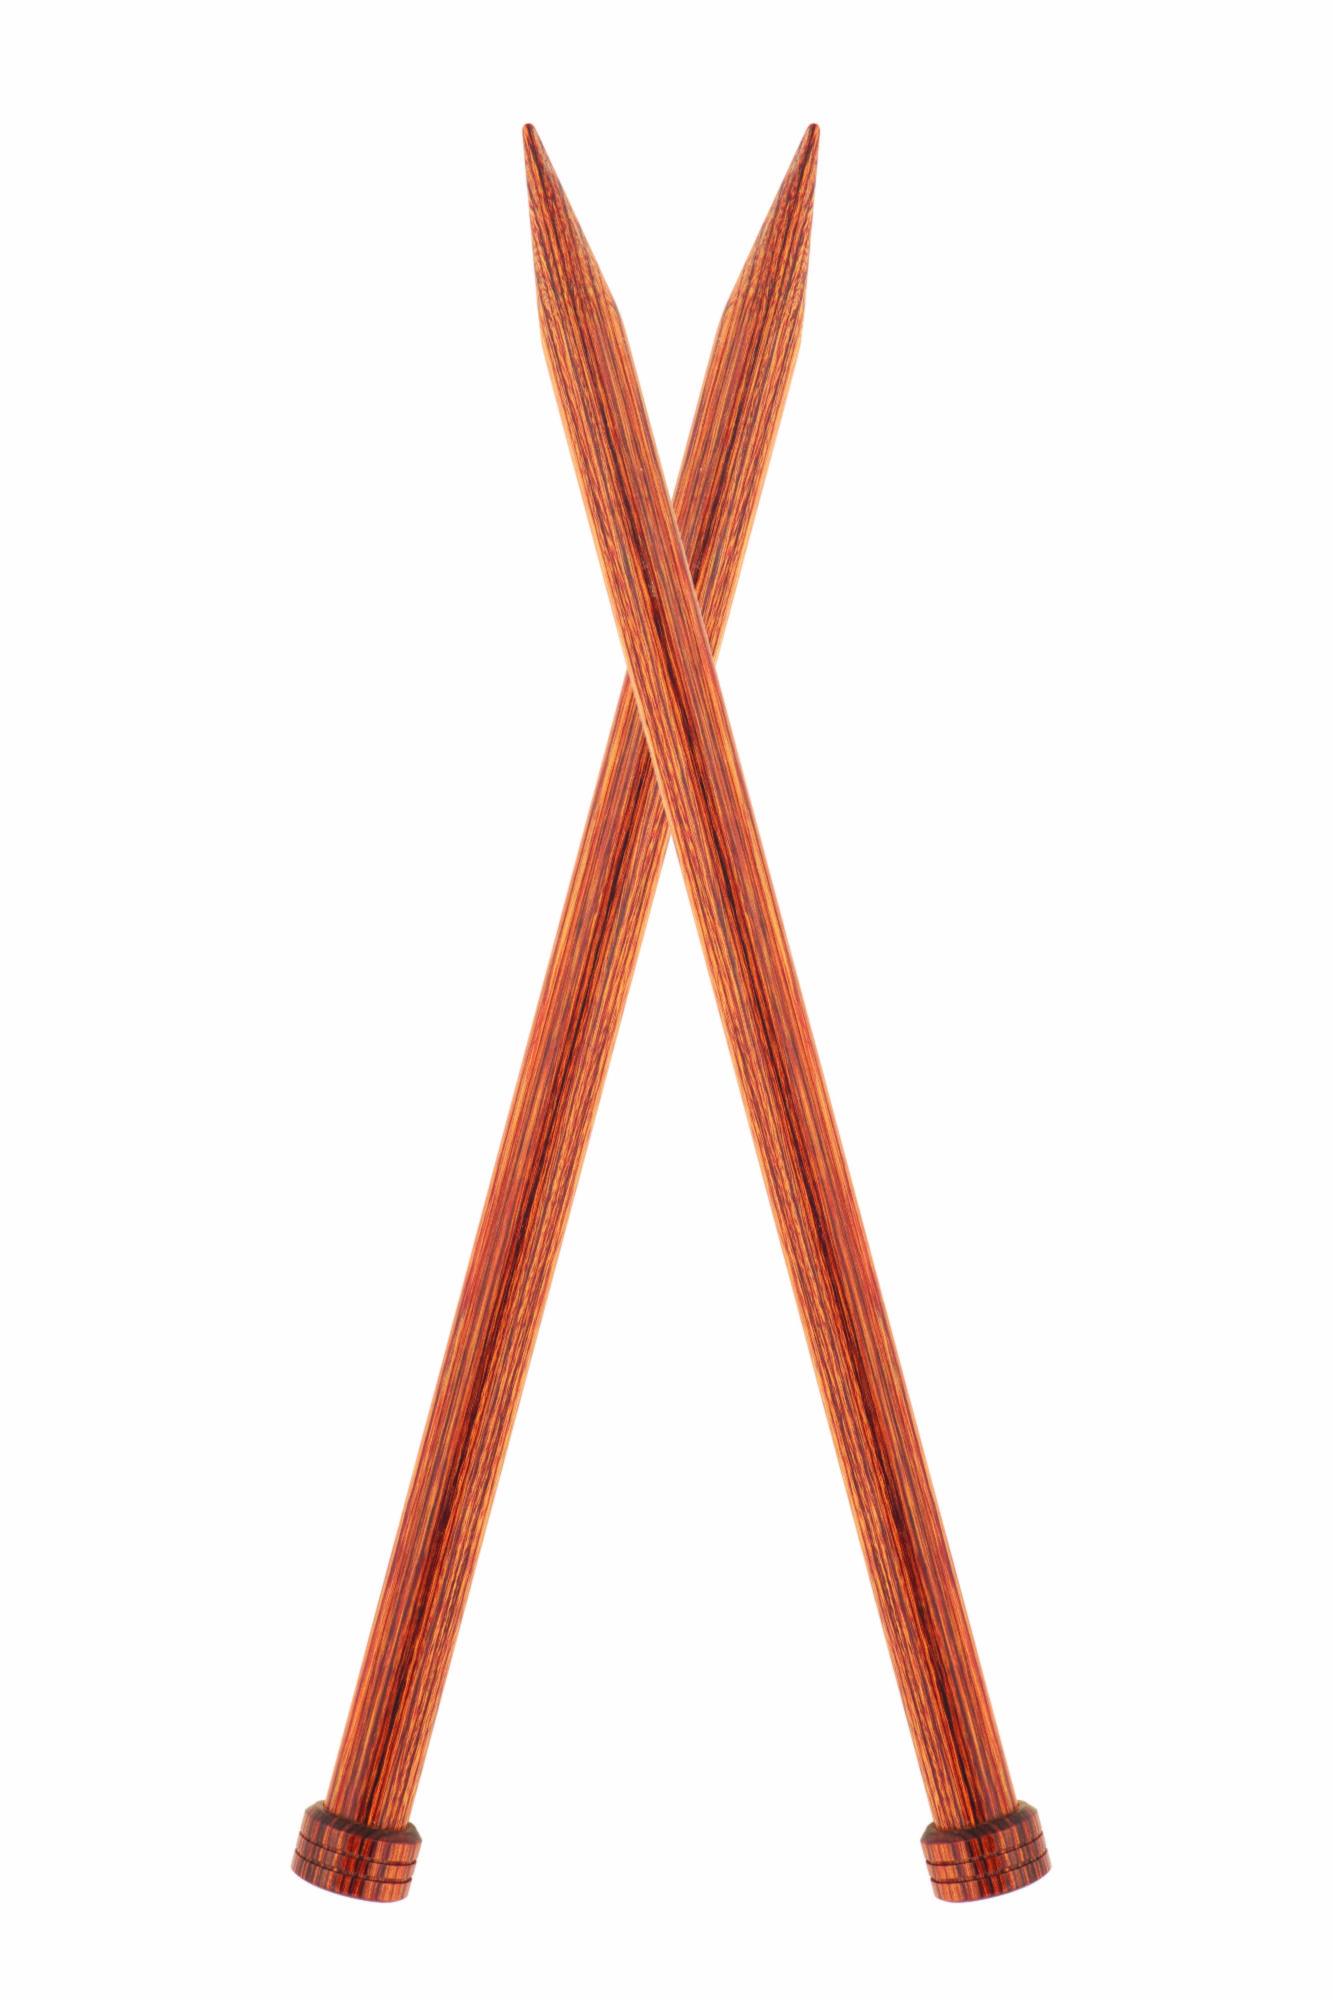 31149 Спицы прямые 6.00 мм - 25 см Ginger KnitPro